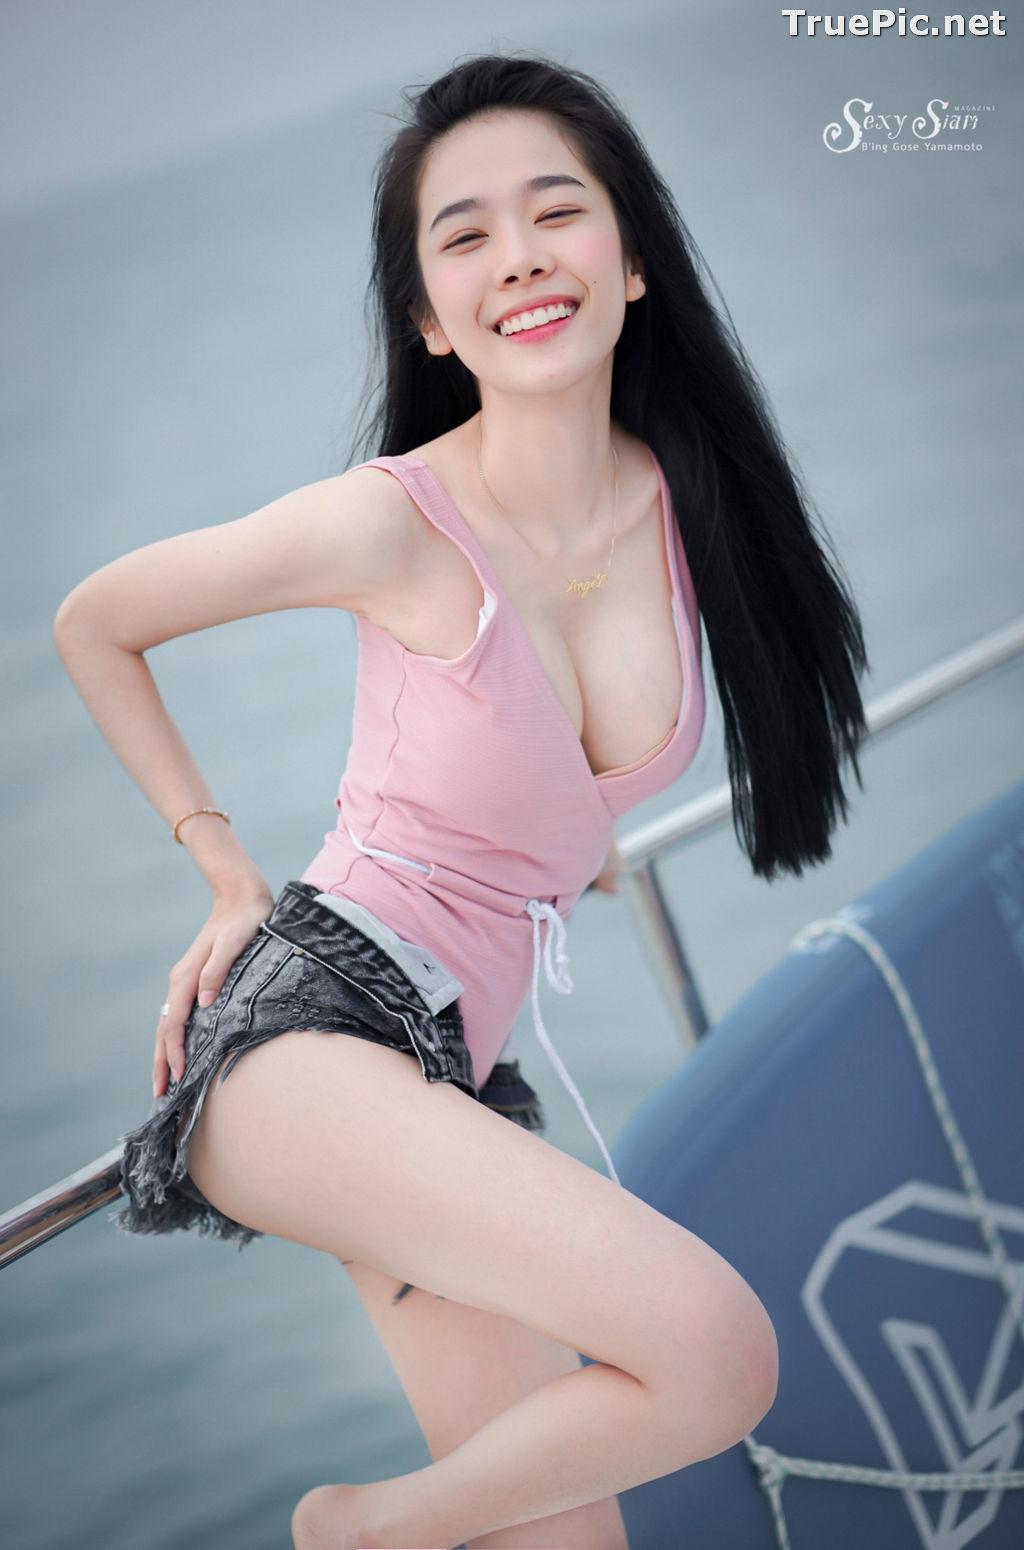 Image Thailand Model - Patcharin Srikunchai - Pink Monokini and Jean Pants - TruePic.net - Picture-5